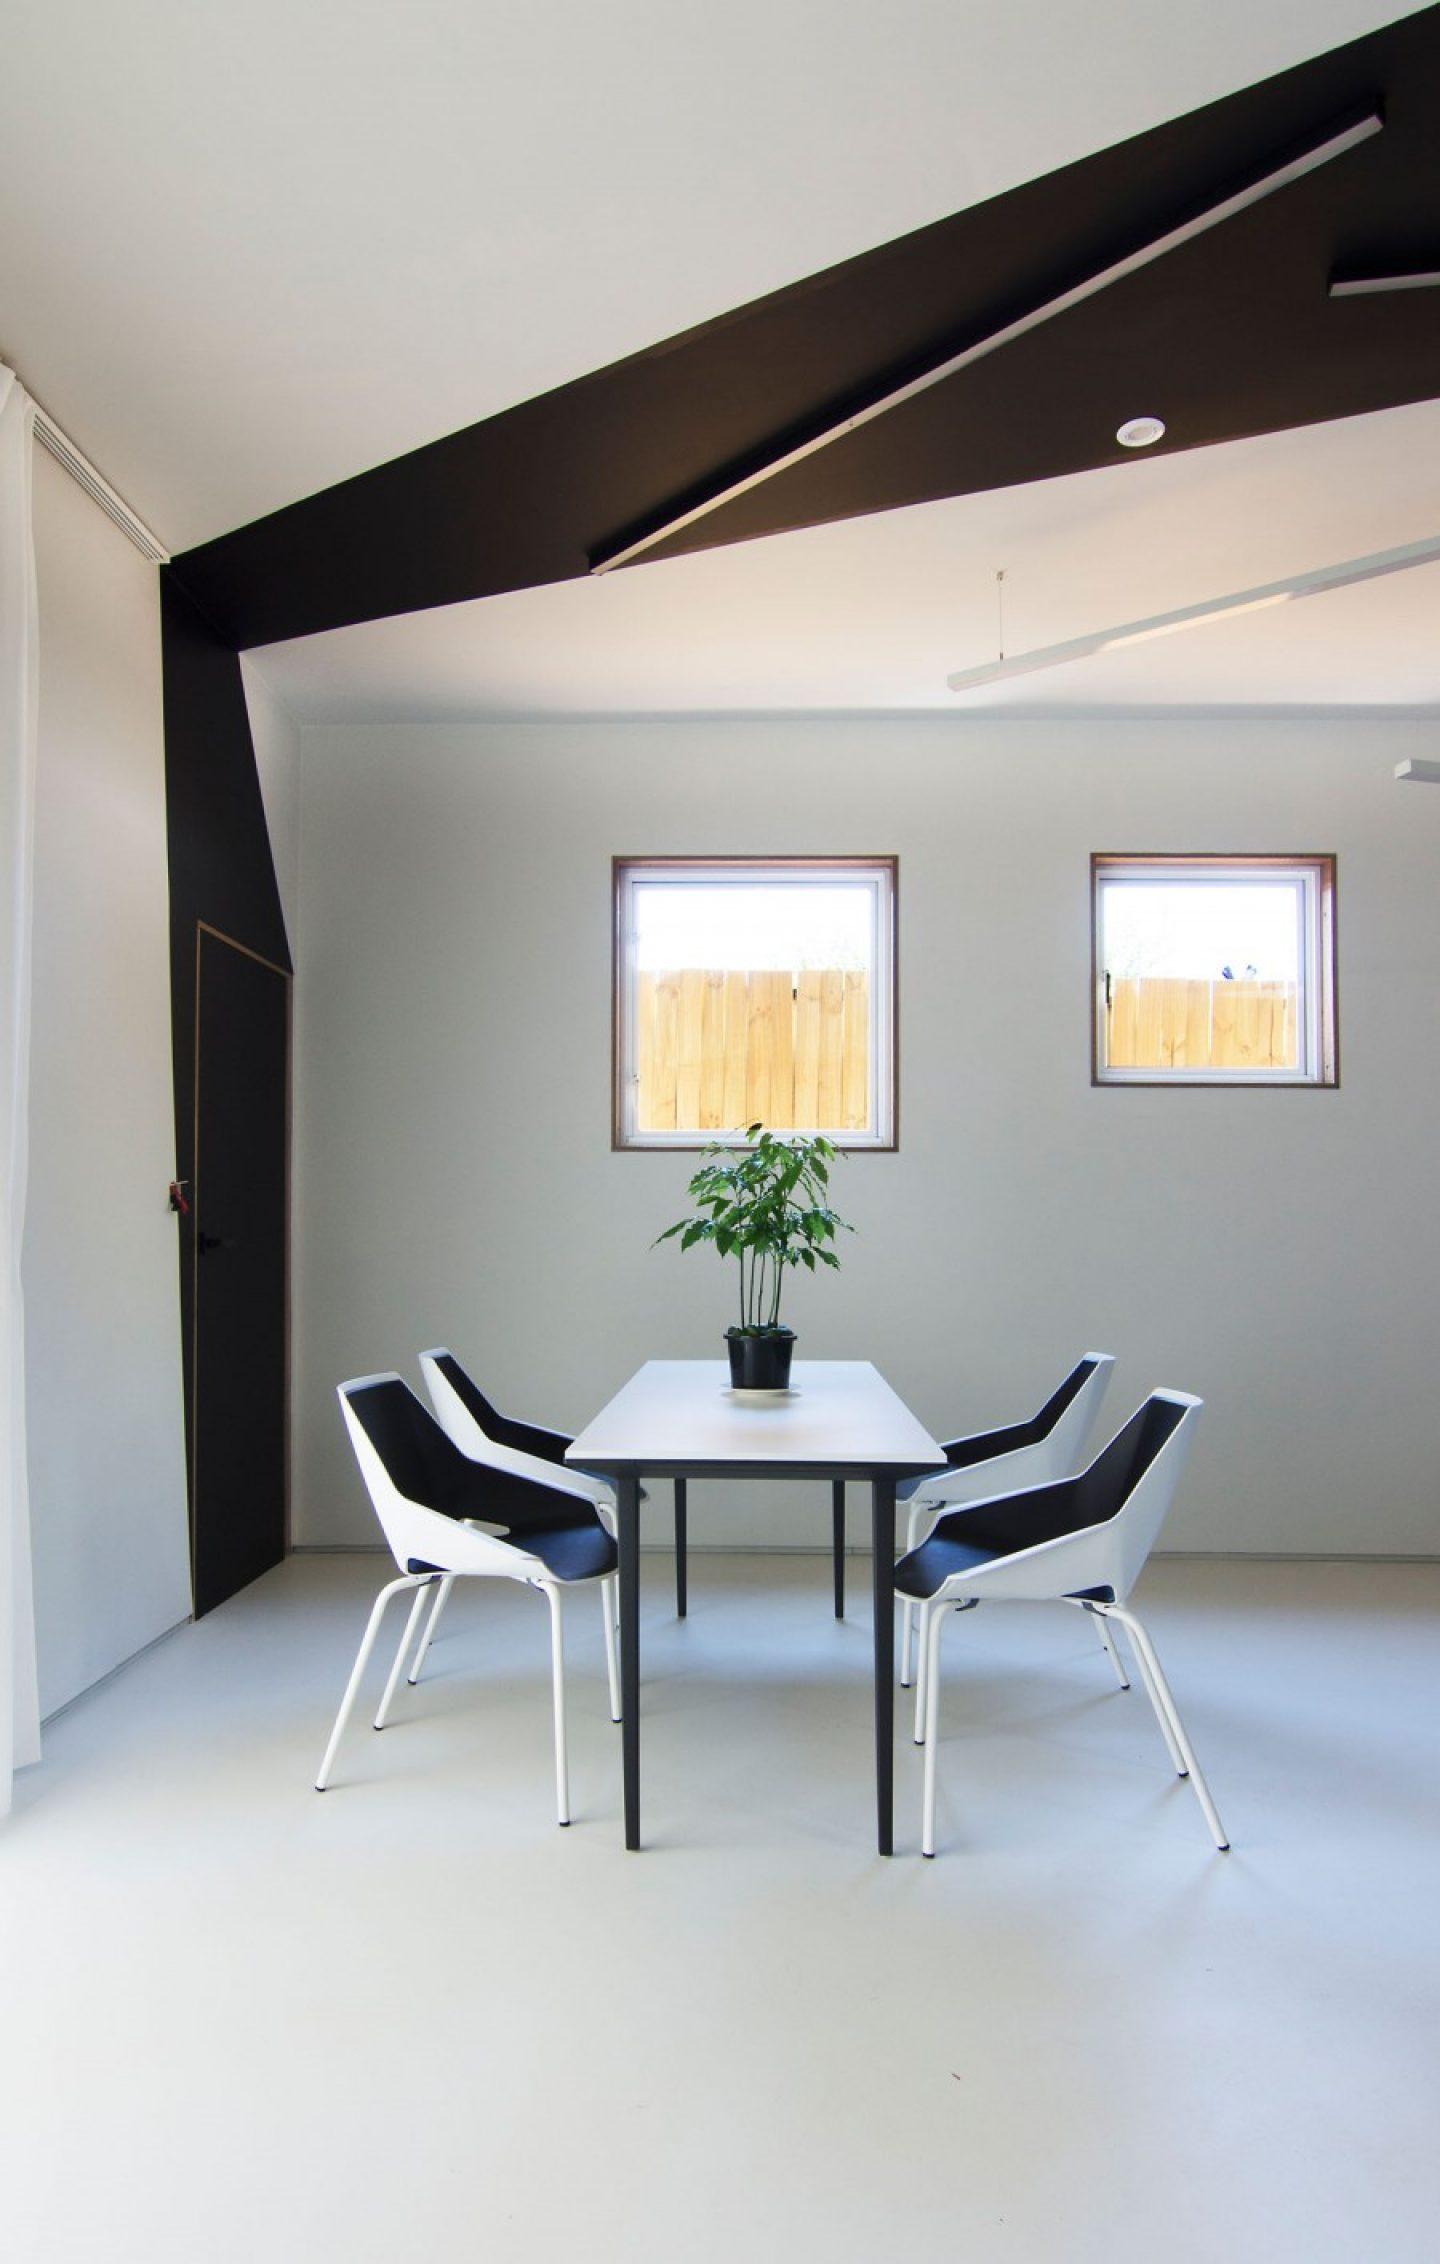 Architecture_House332_GrafikaArchitects_09